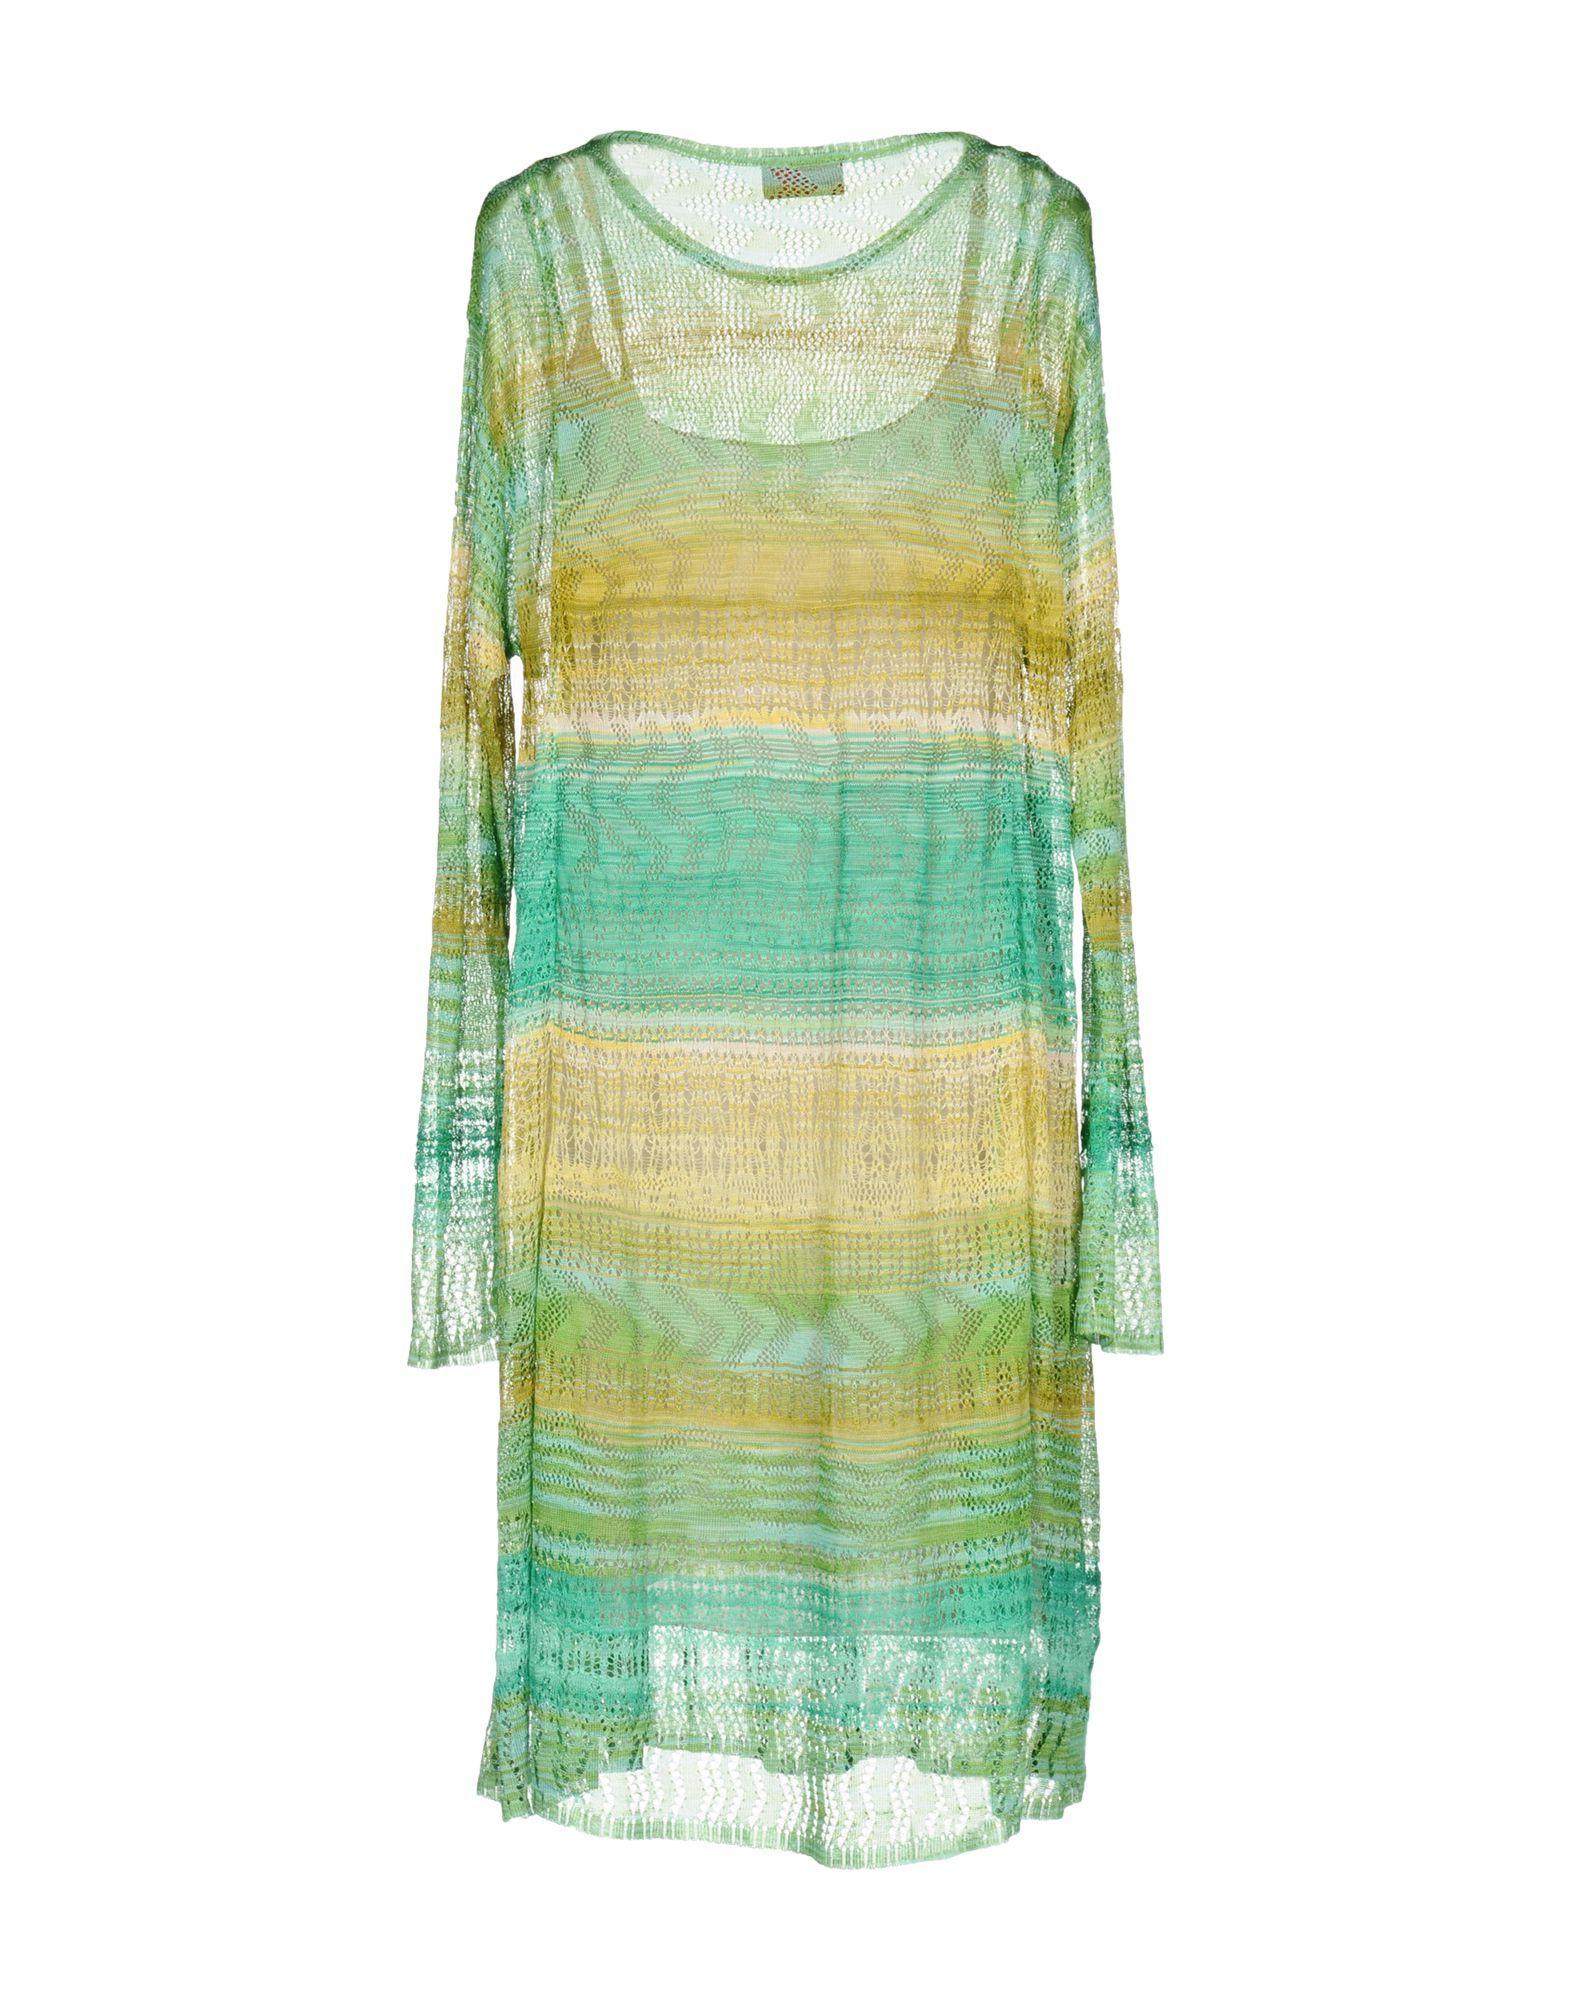 Missoni Light Green Knit Long Sleeve Dress